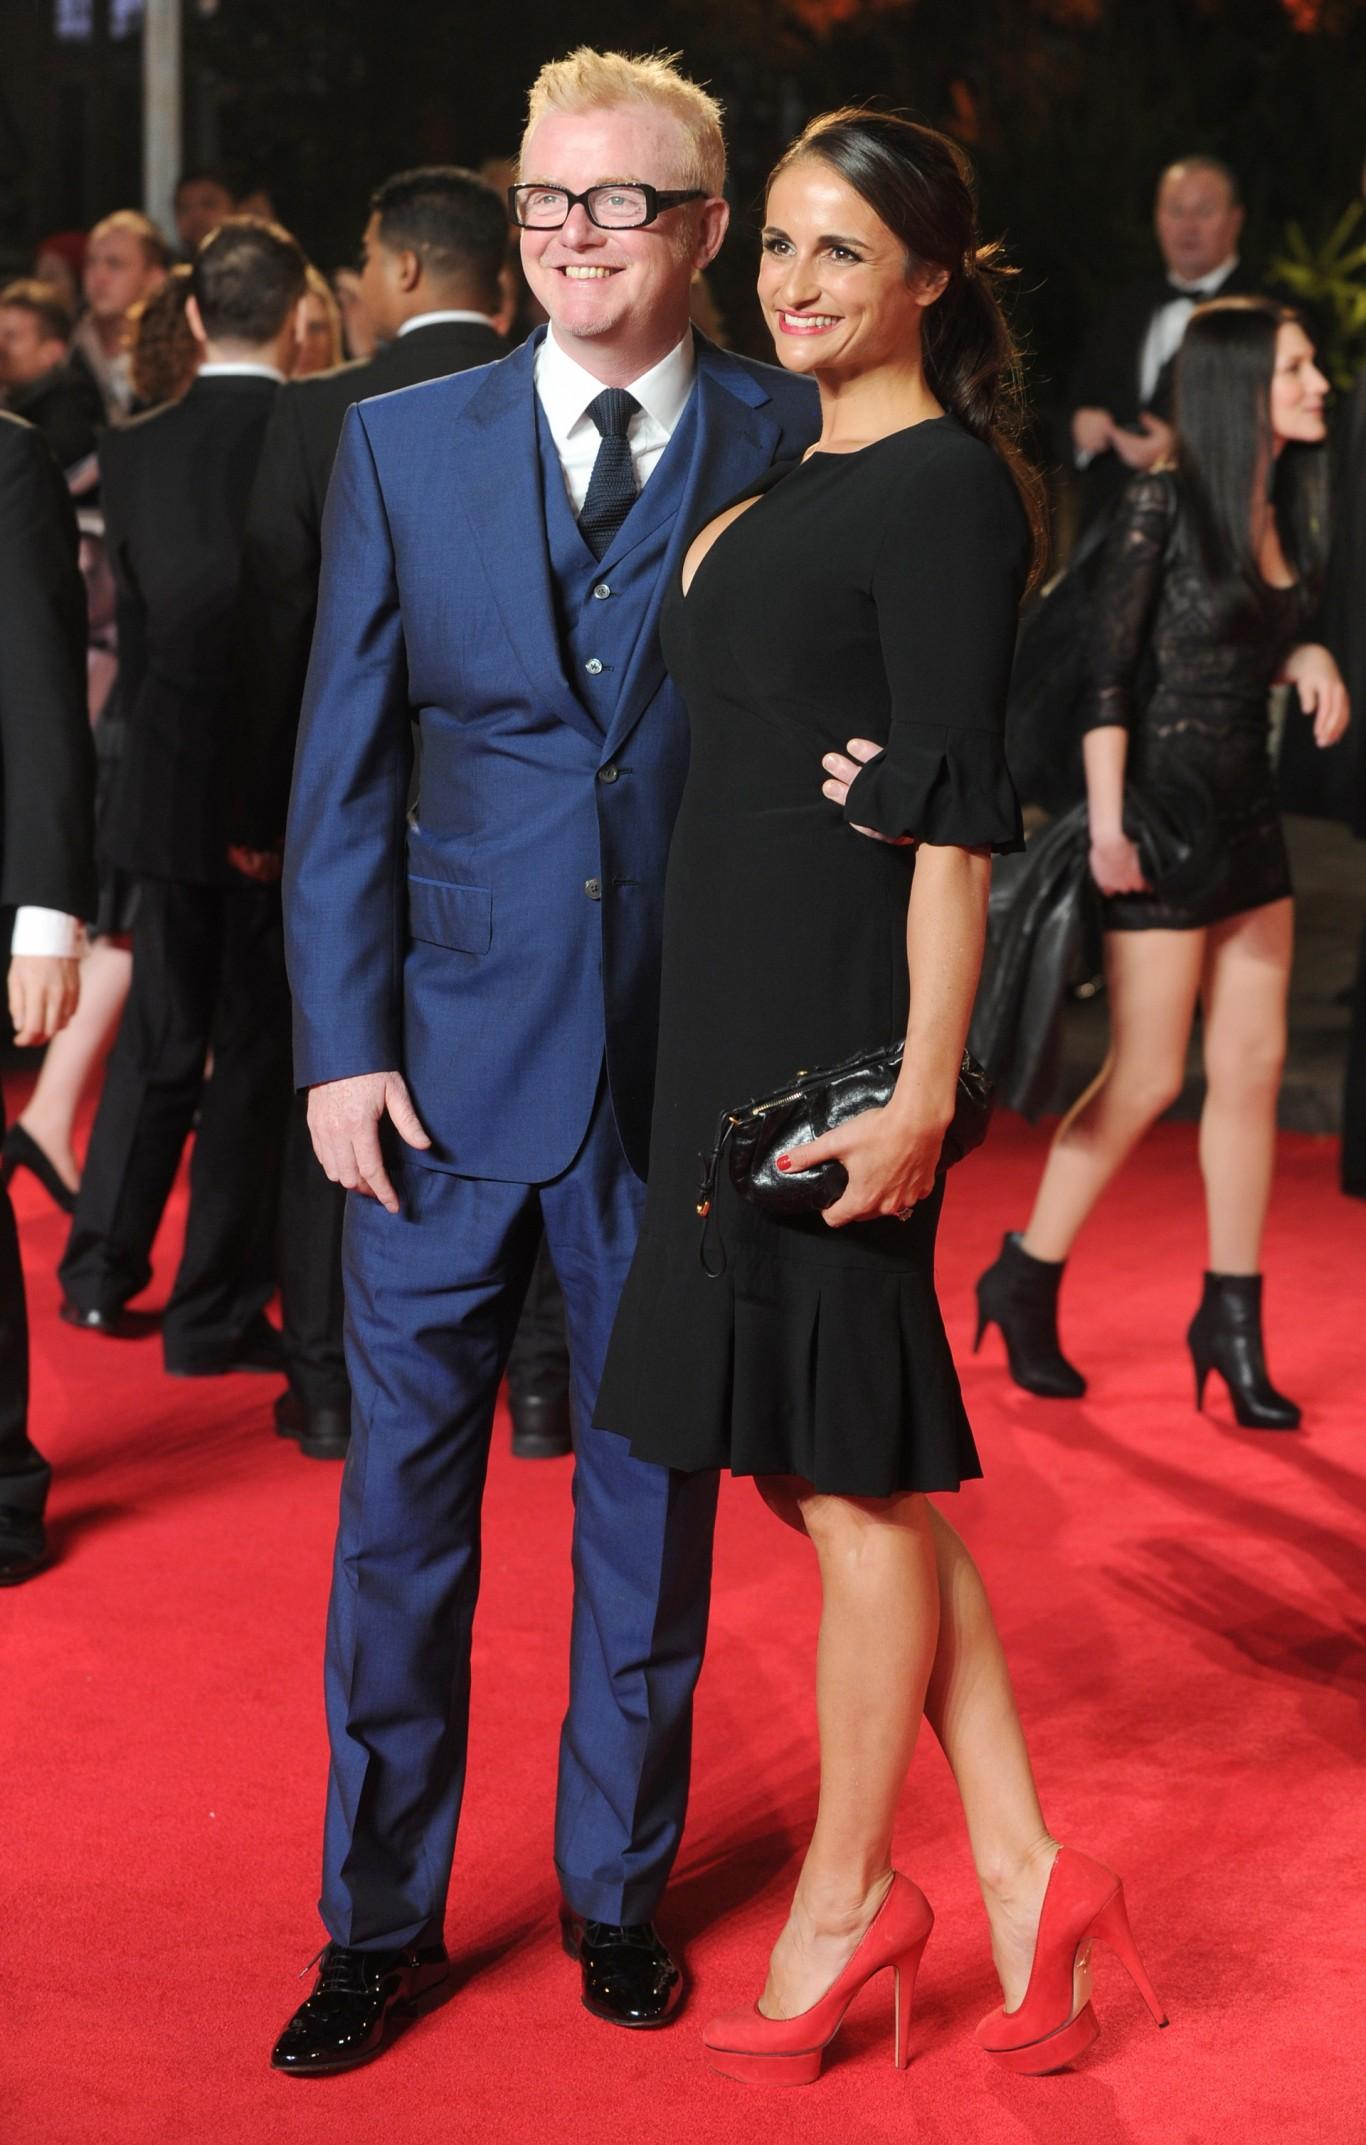 Chris Evans with wife Natasha